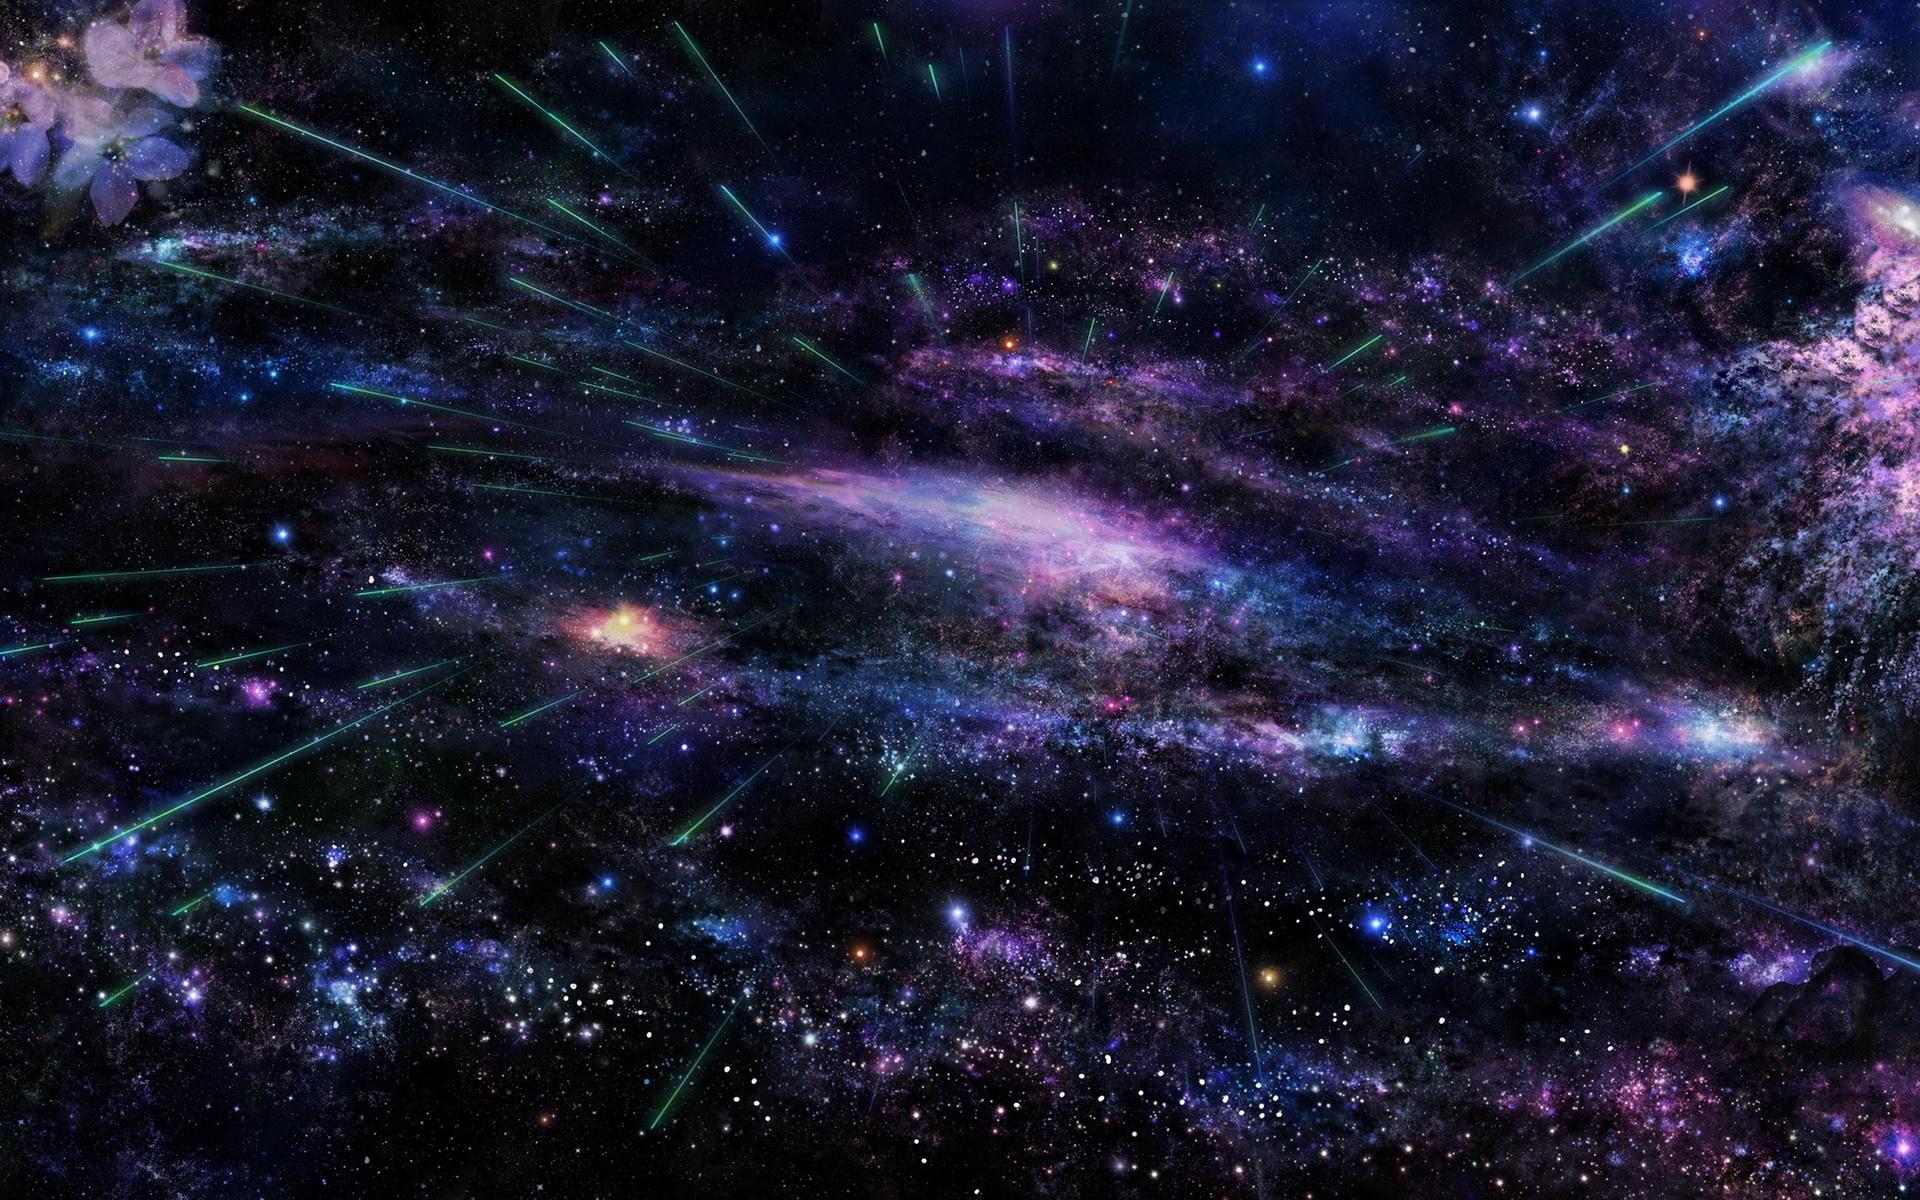 universe desktop wallpaper 4k-#15